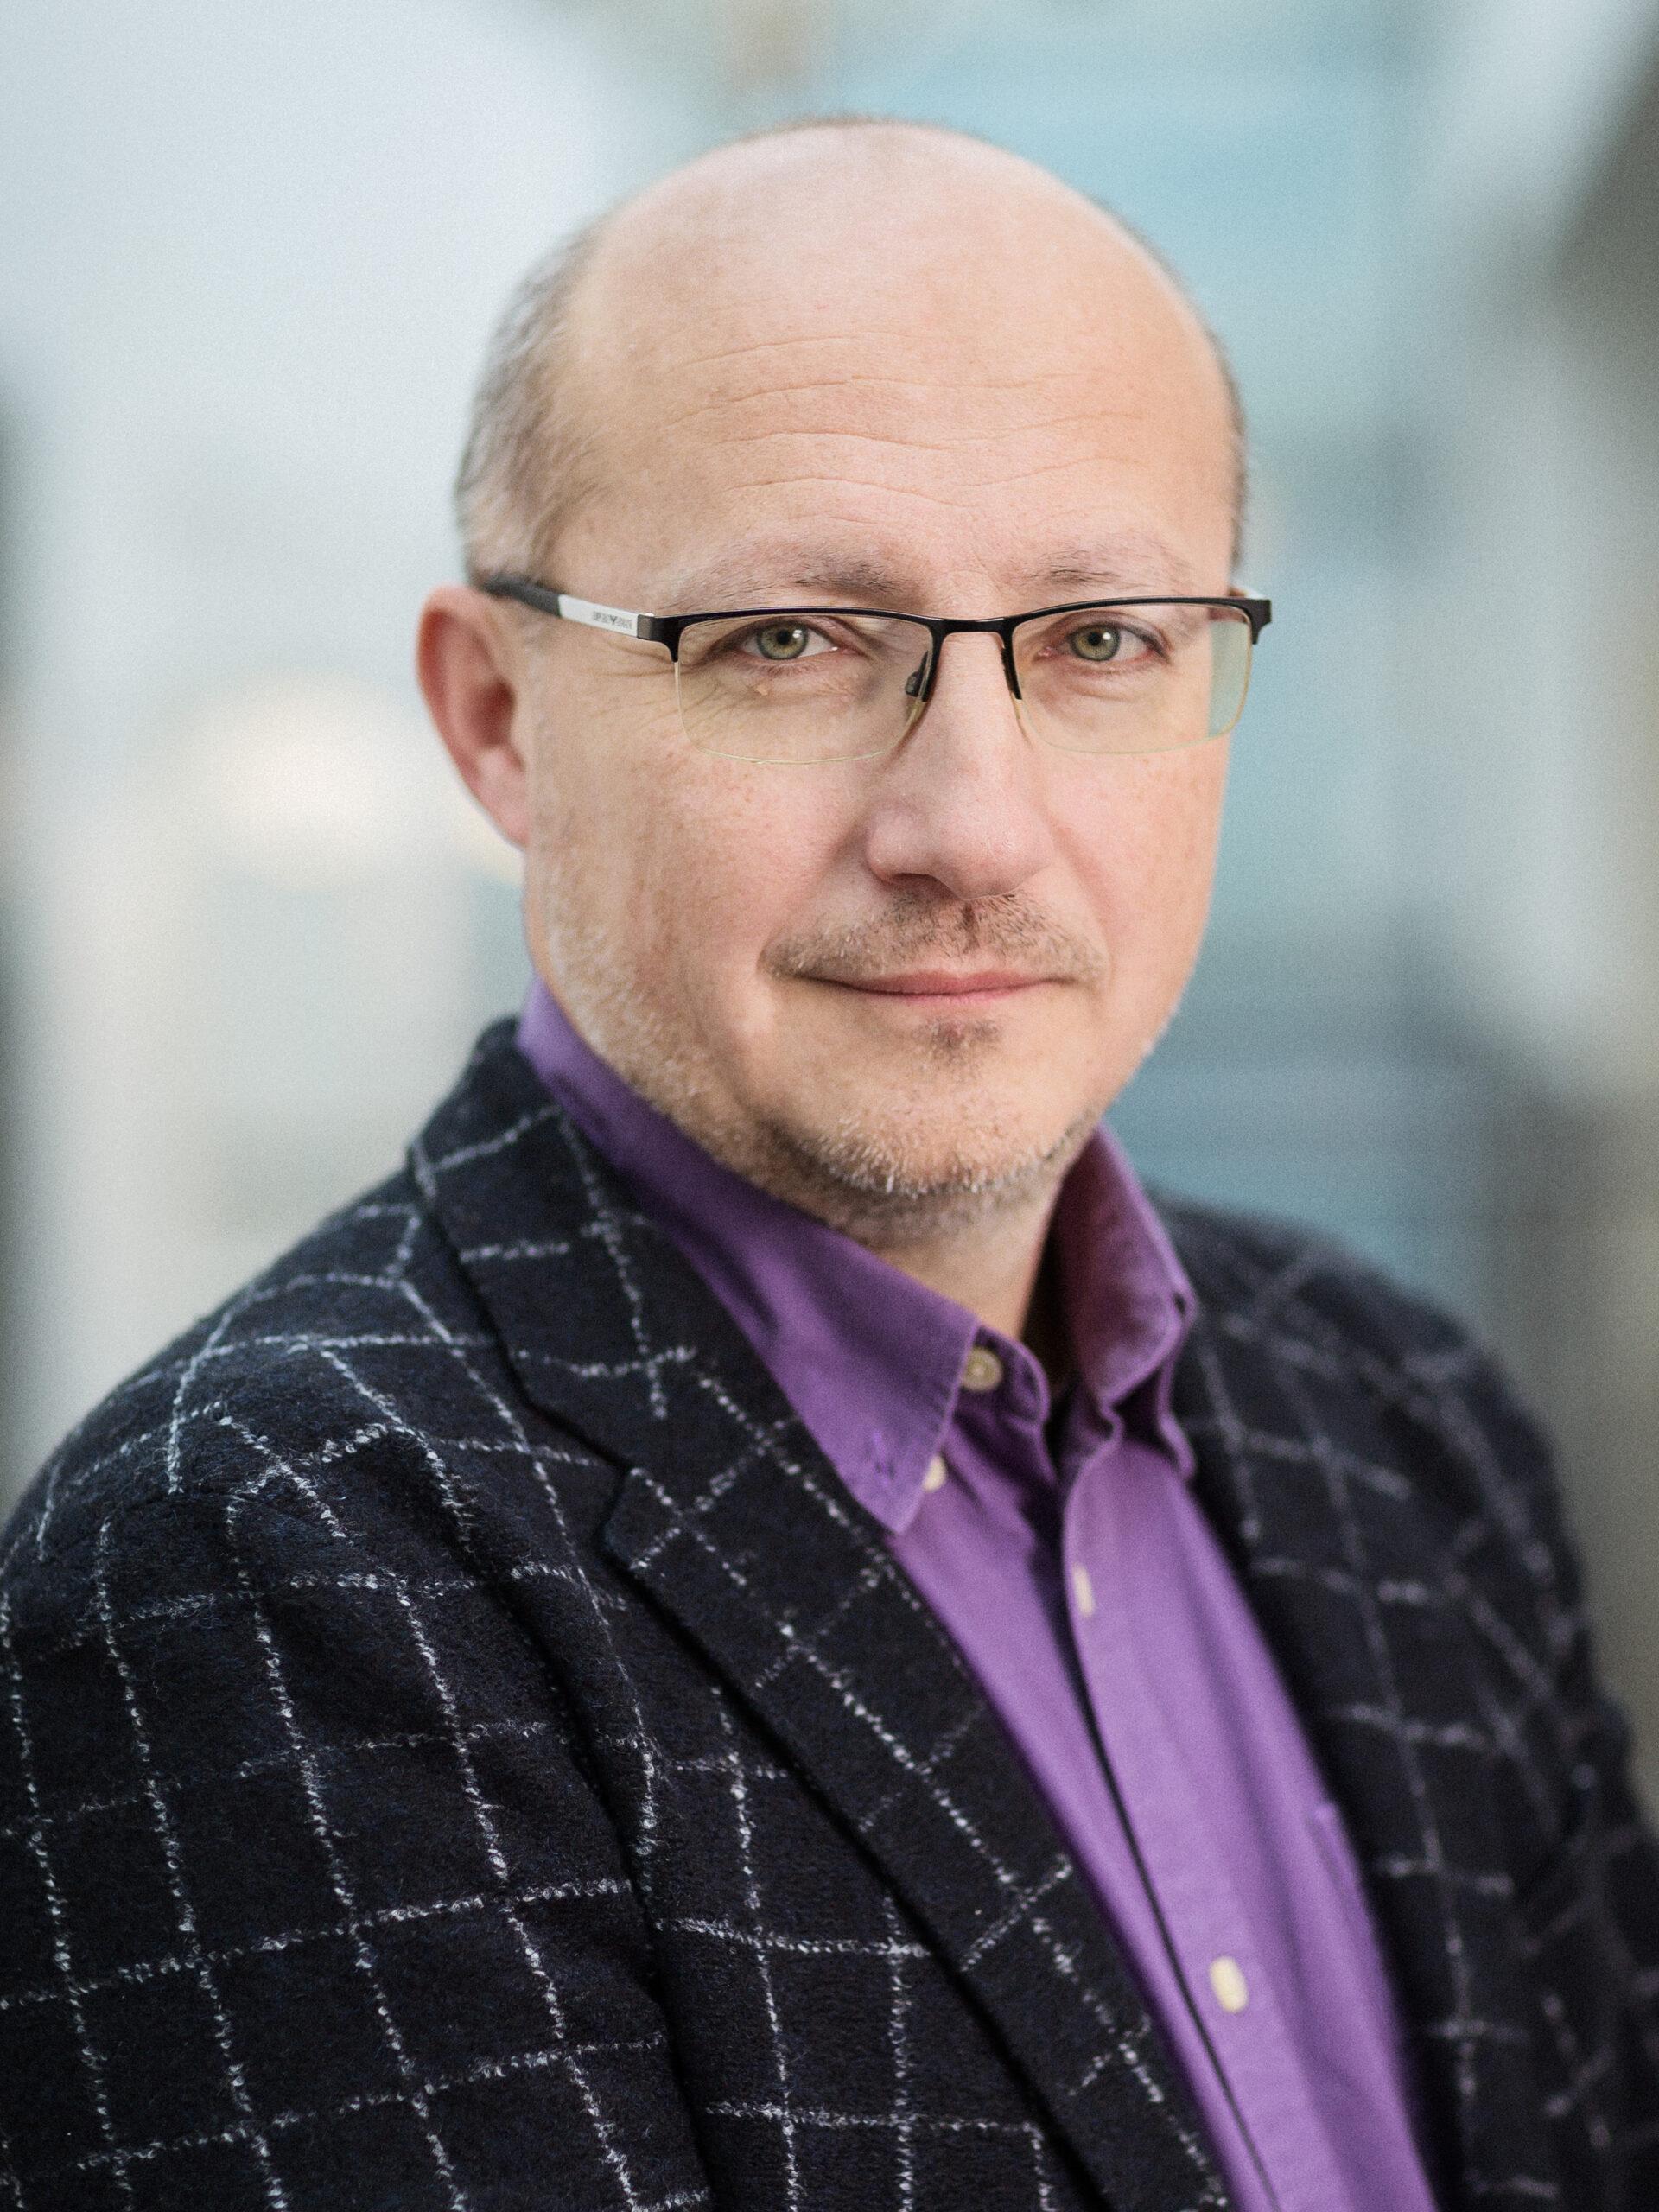 Vladyslav Soroka